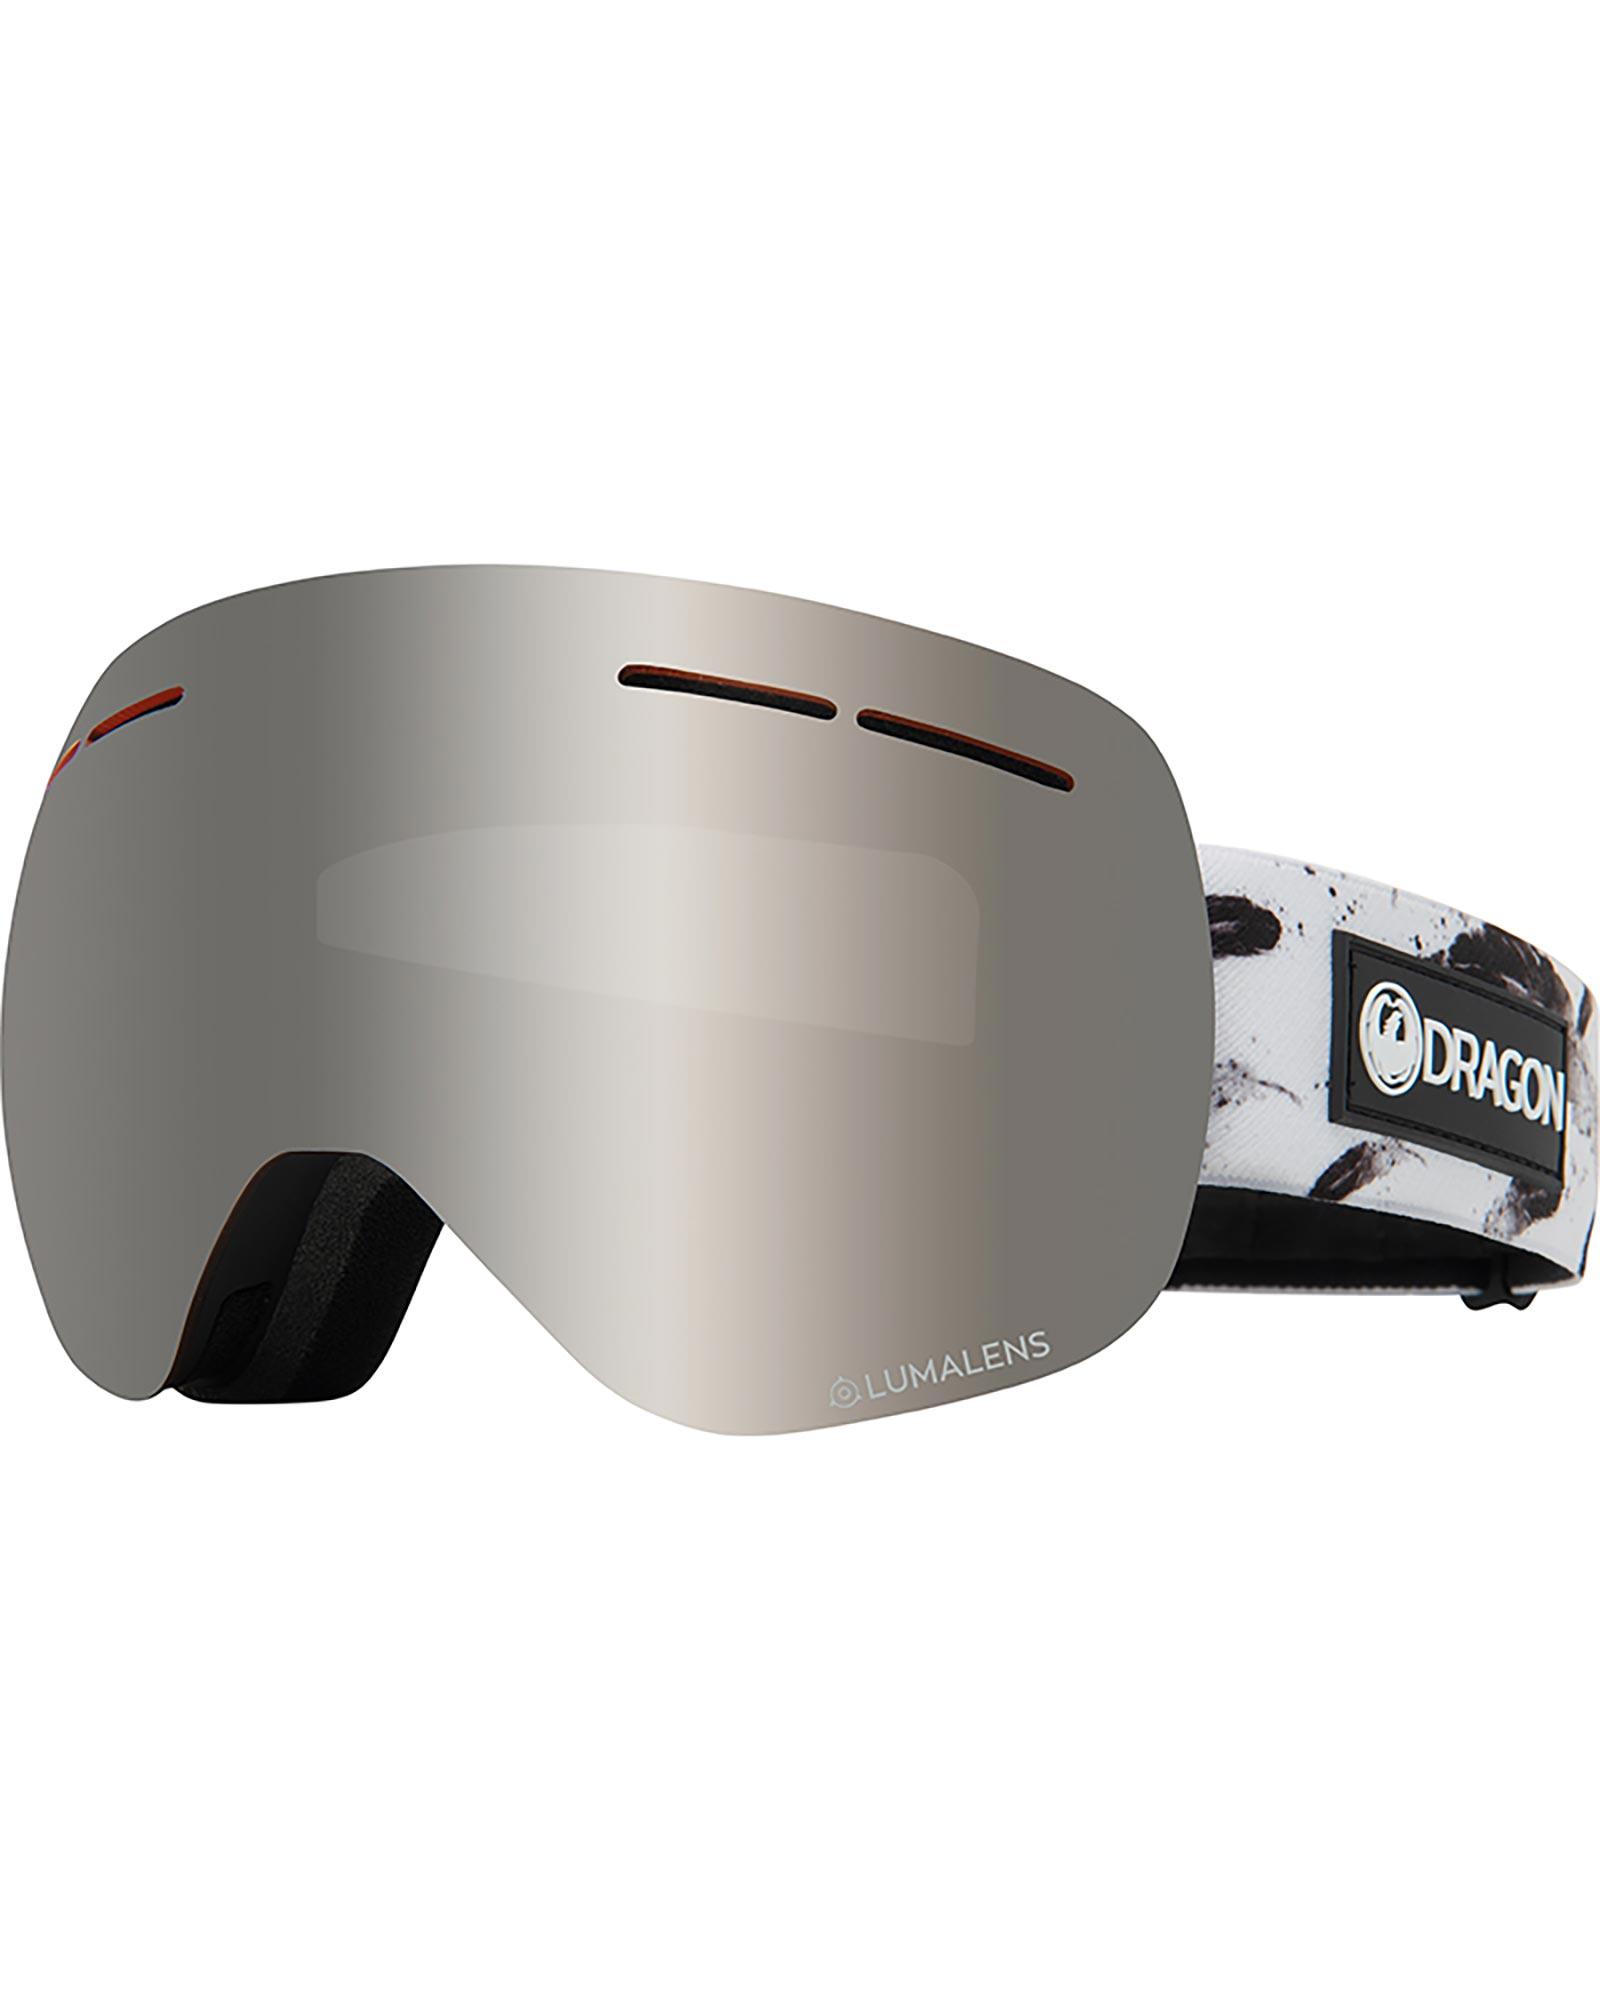 Dragon X1s Feather / Lumalens Silver Ionized + Lumalens Flash Blue Women's Goggles 0